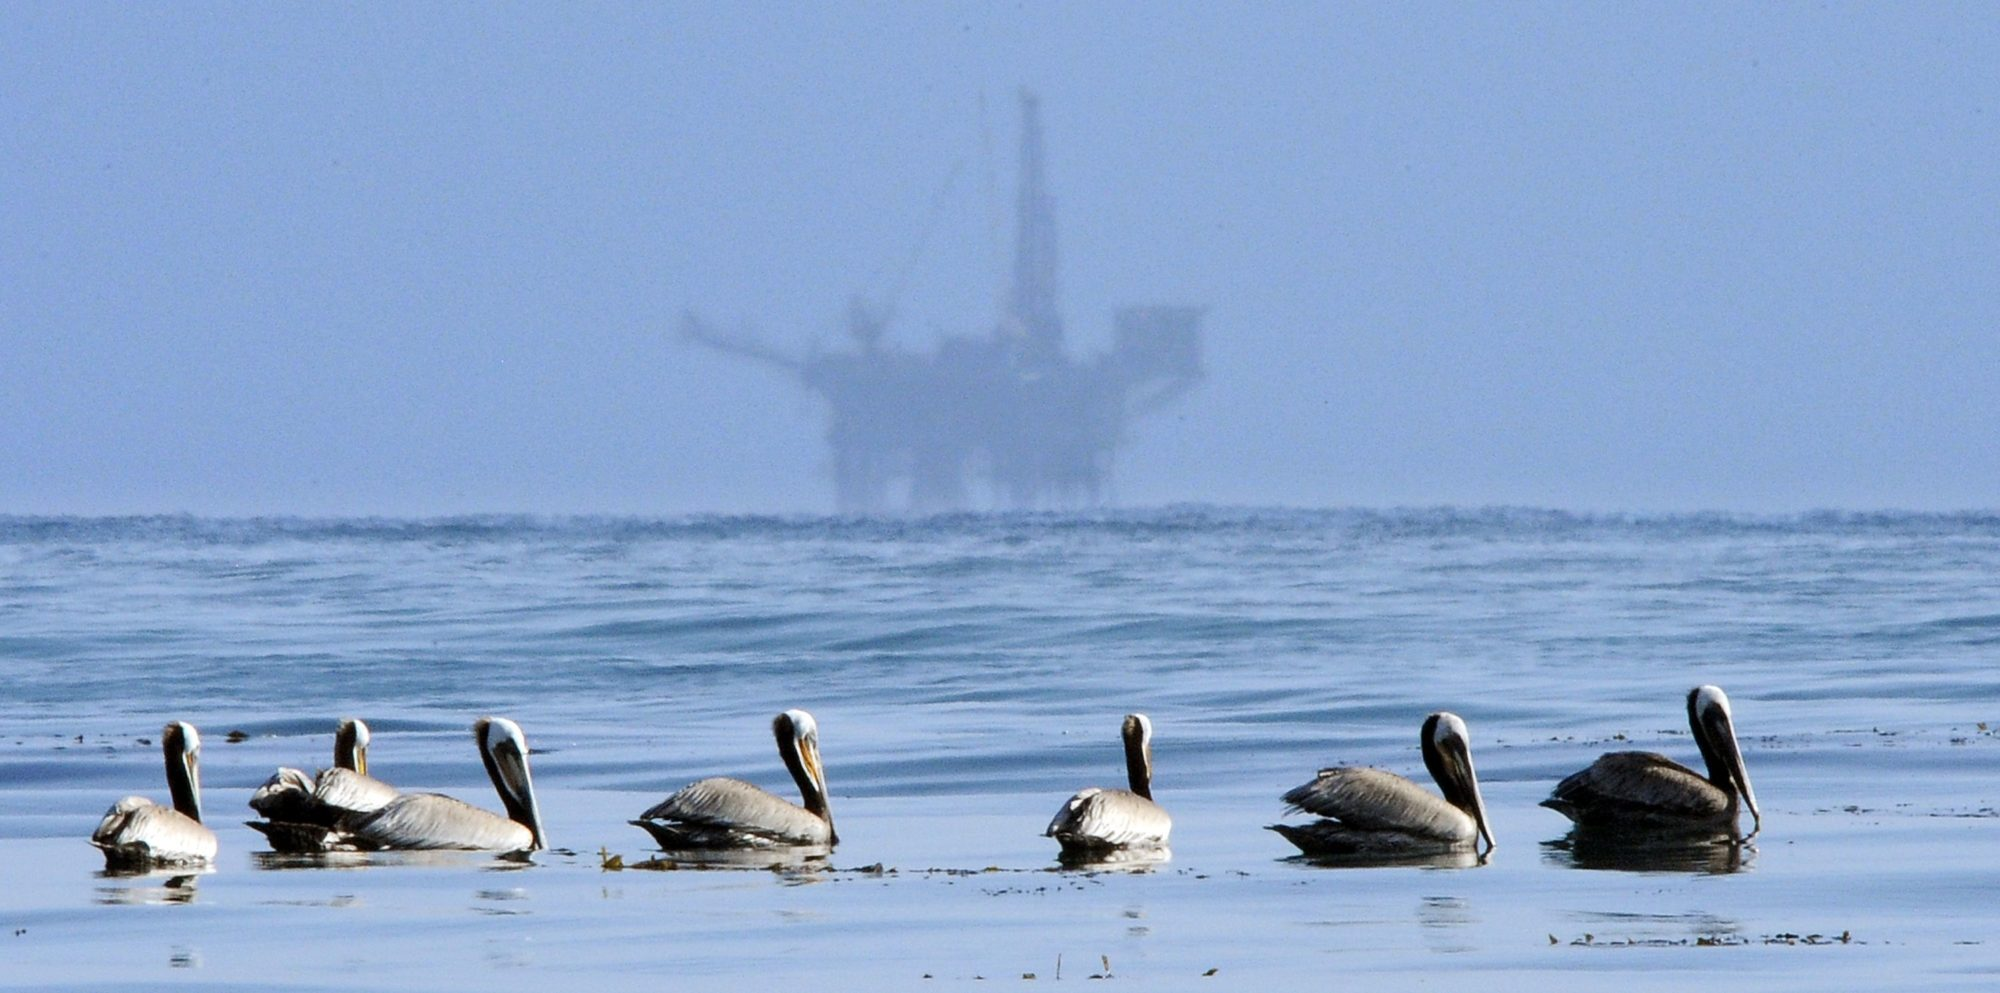 oil-platform-Florida-e1521585128111.jpg